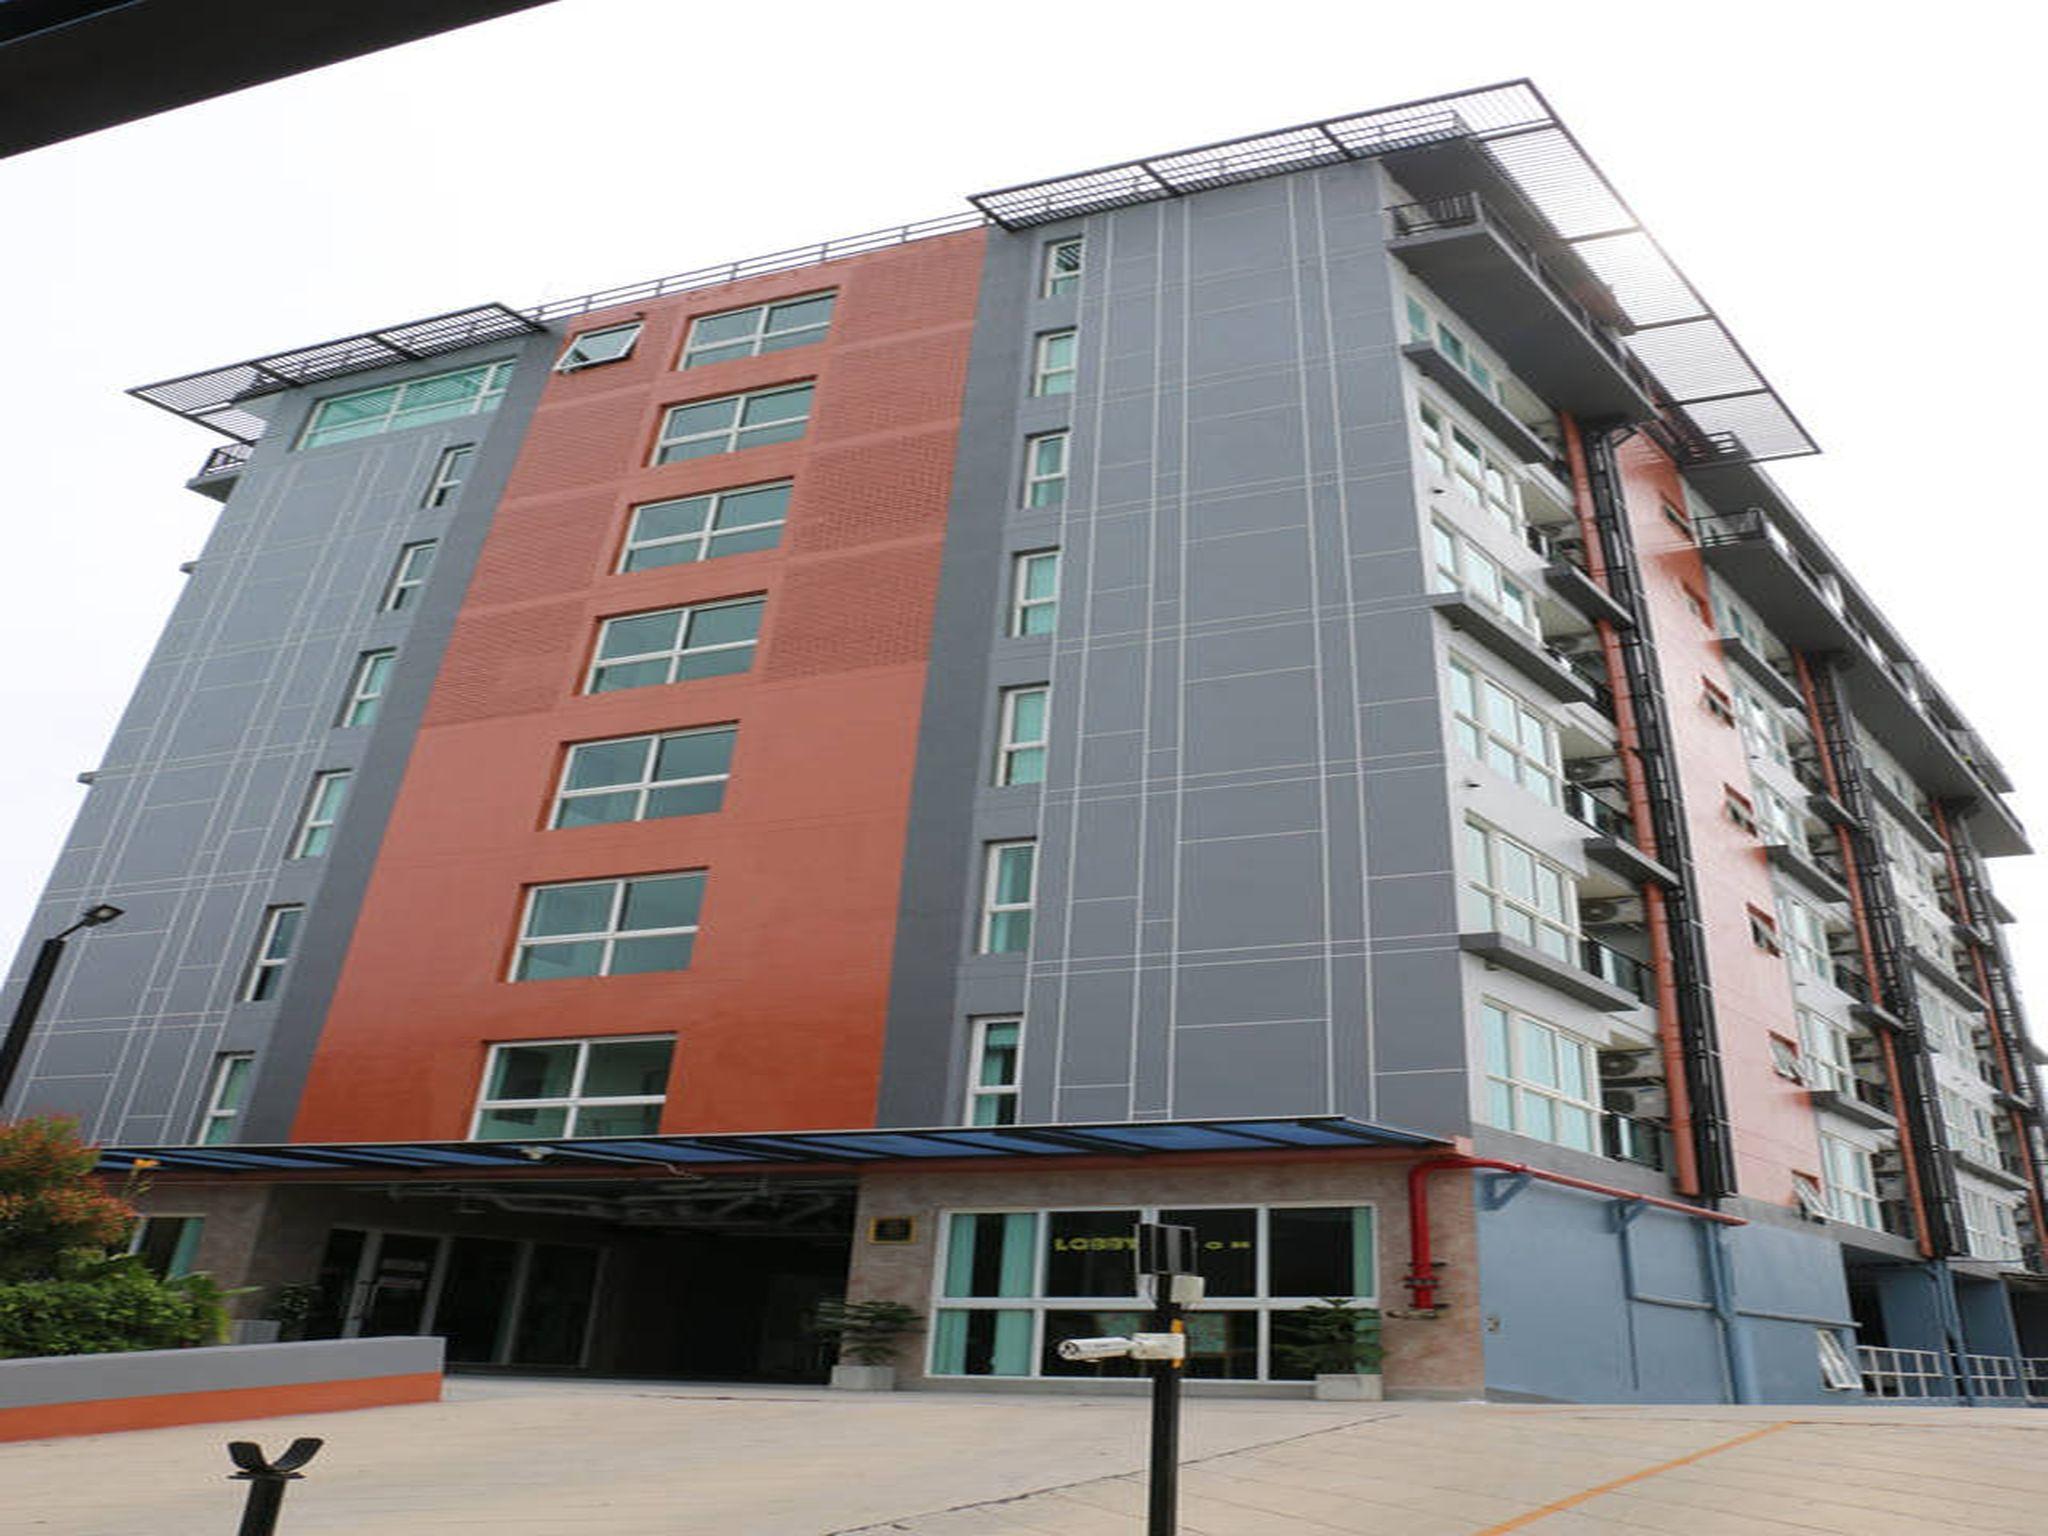 Me Residence & Me Condominium มี เรสซิเดนซ์ แอนด์ มี คอนโดมิเนี่ยม